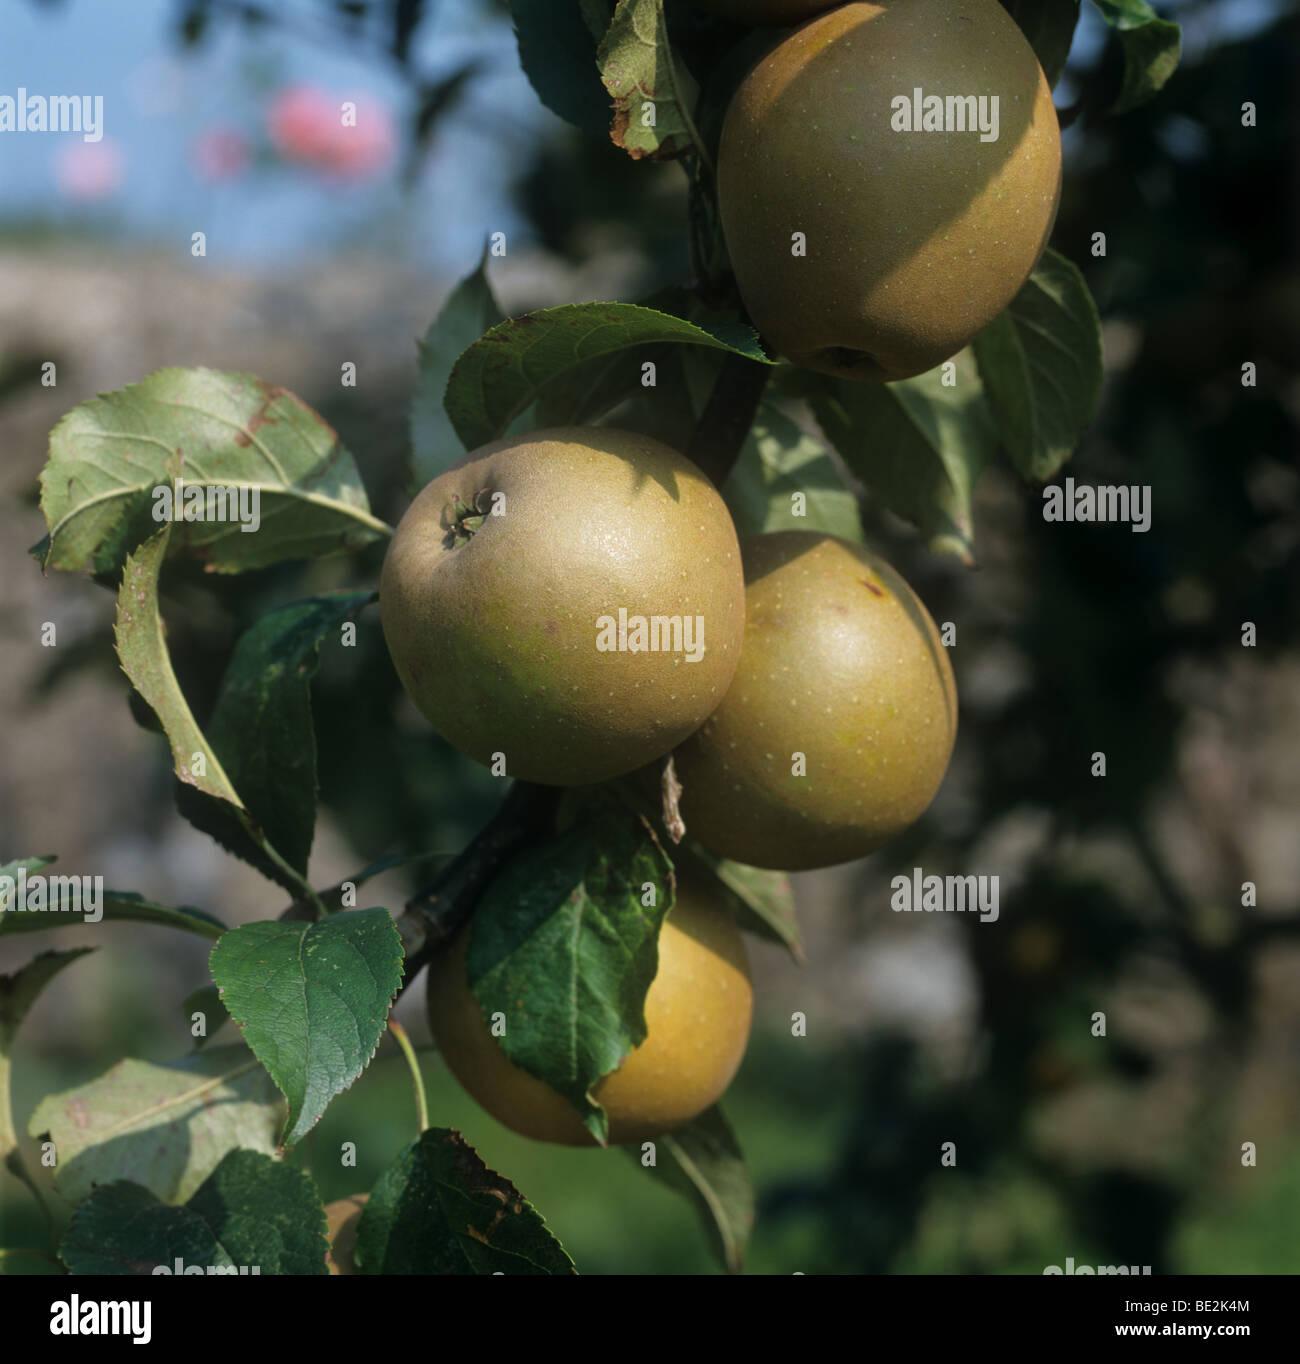 Ripe 'Egremont Russet' apples on the tree, Devon - Stock Image